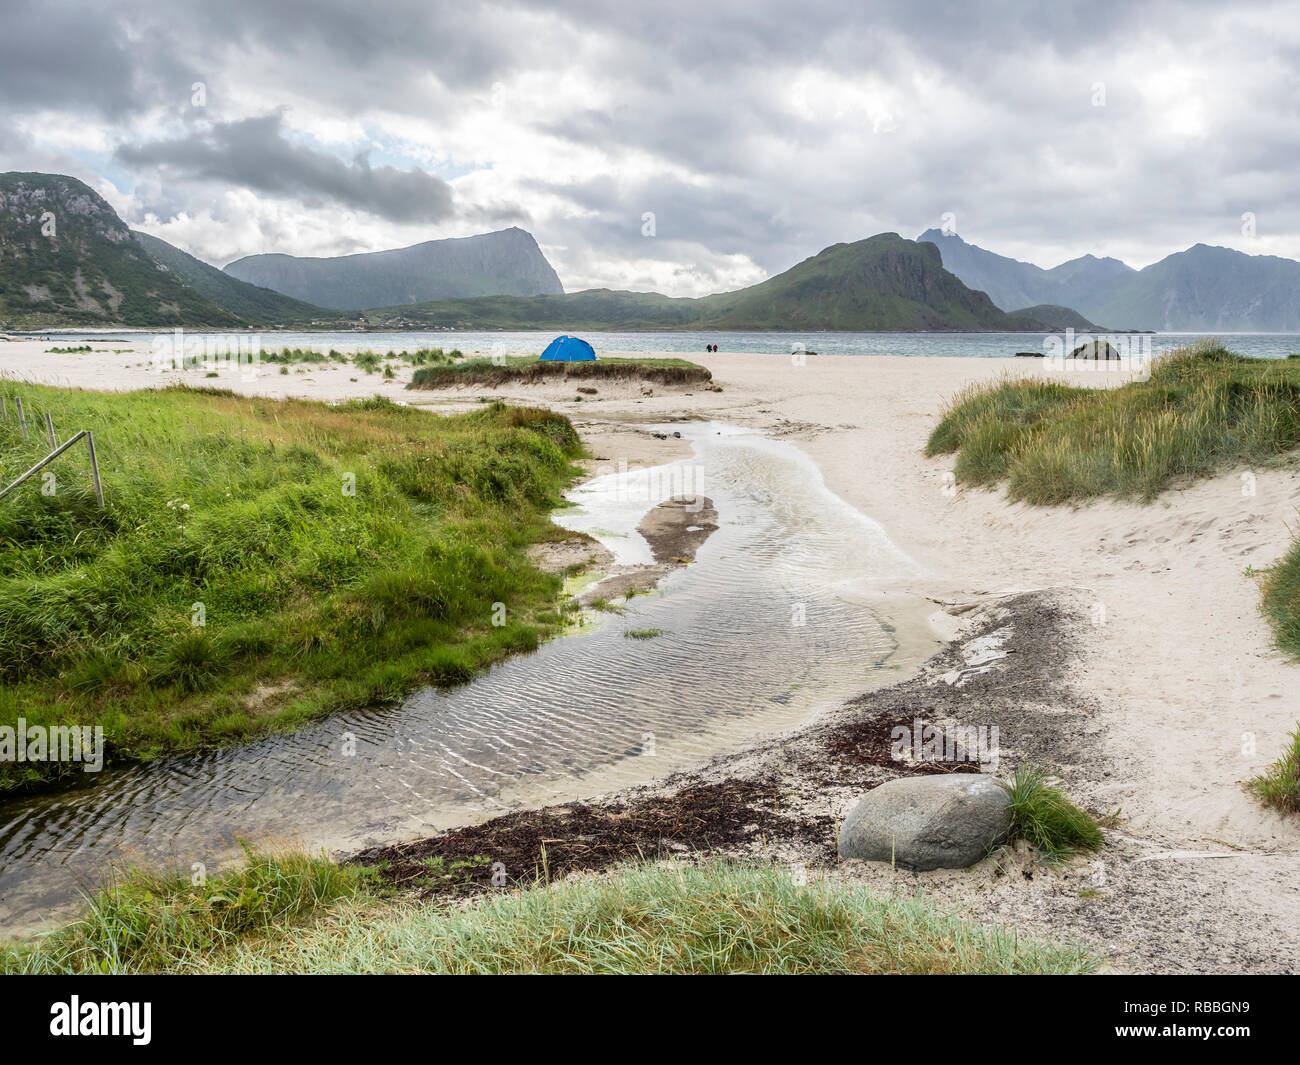 Hauklandstranda, Haukland beach,  lonely tent on sandy beach,  island Vestvagöy, Lofoten, Norway - Stock Image